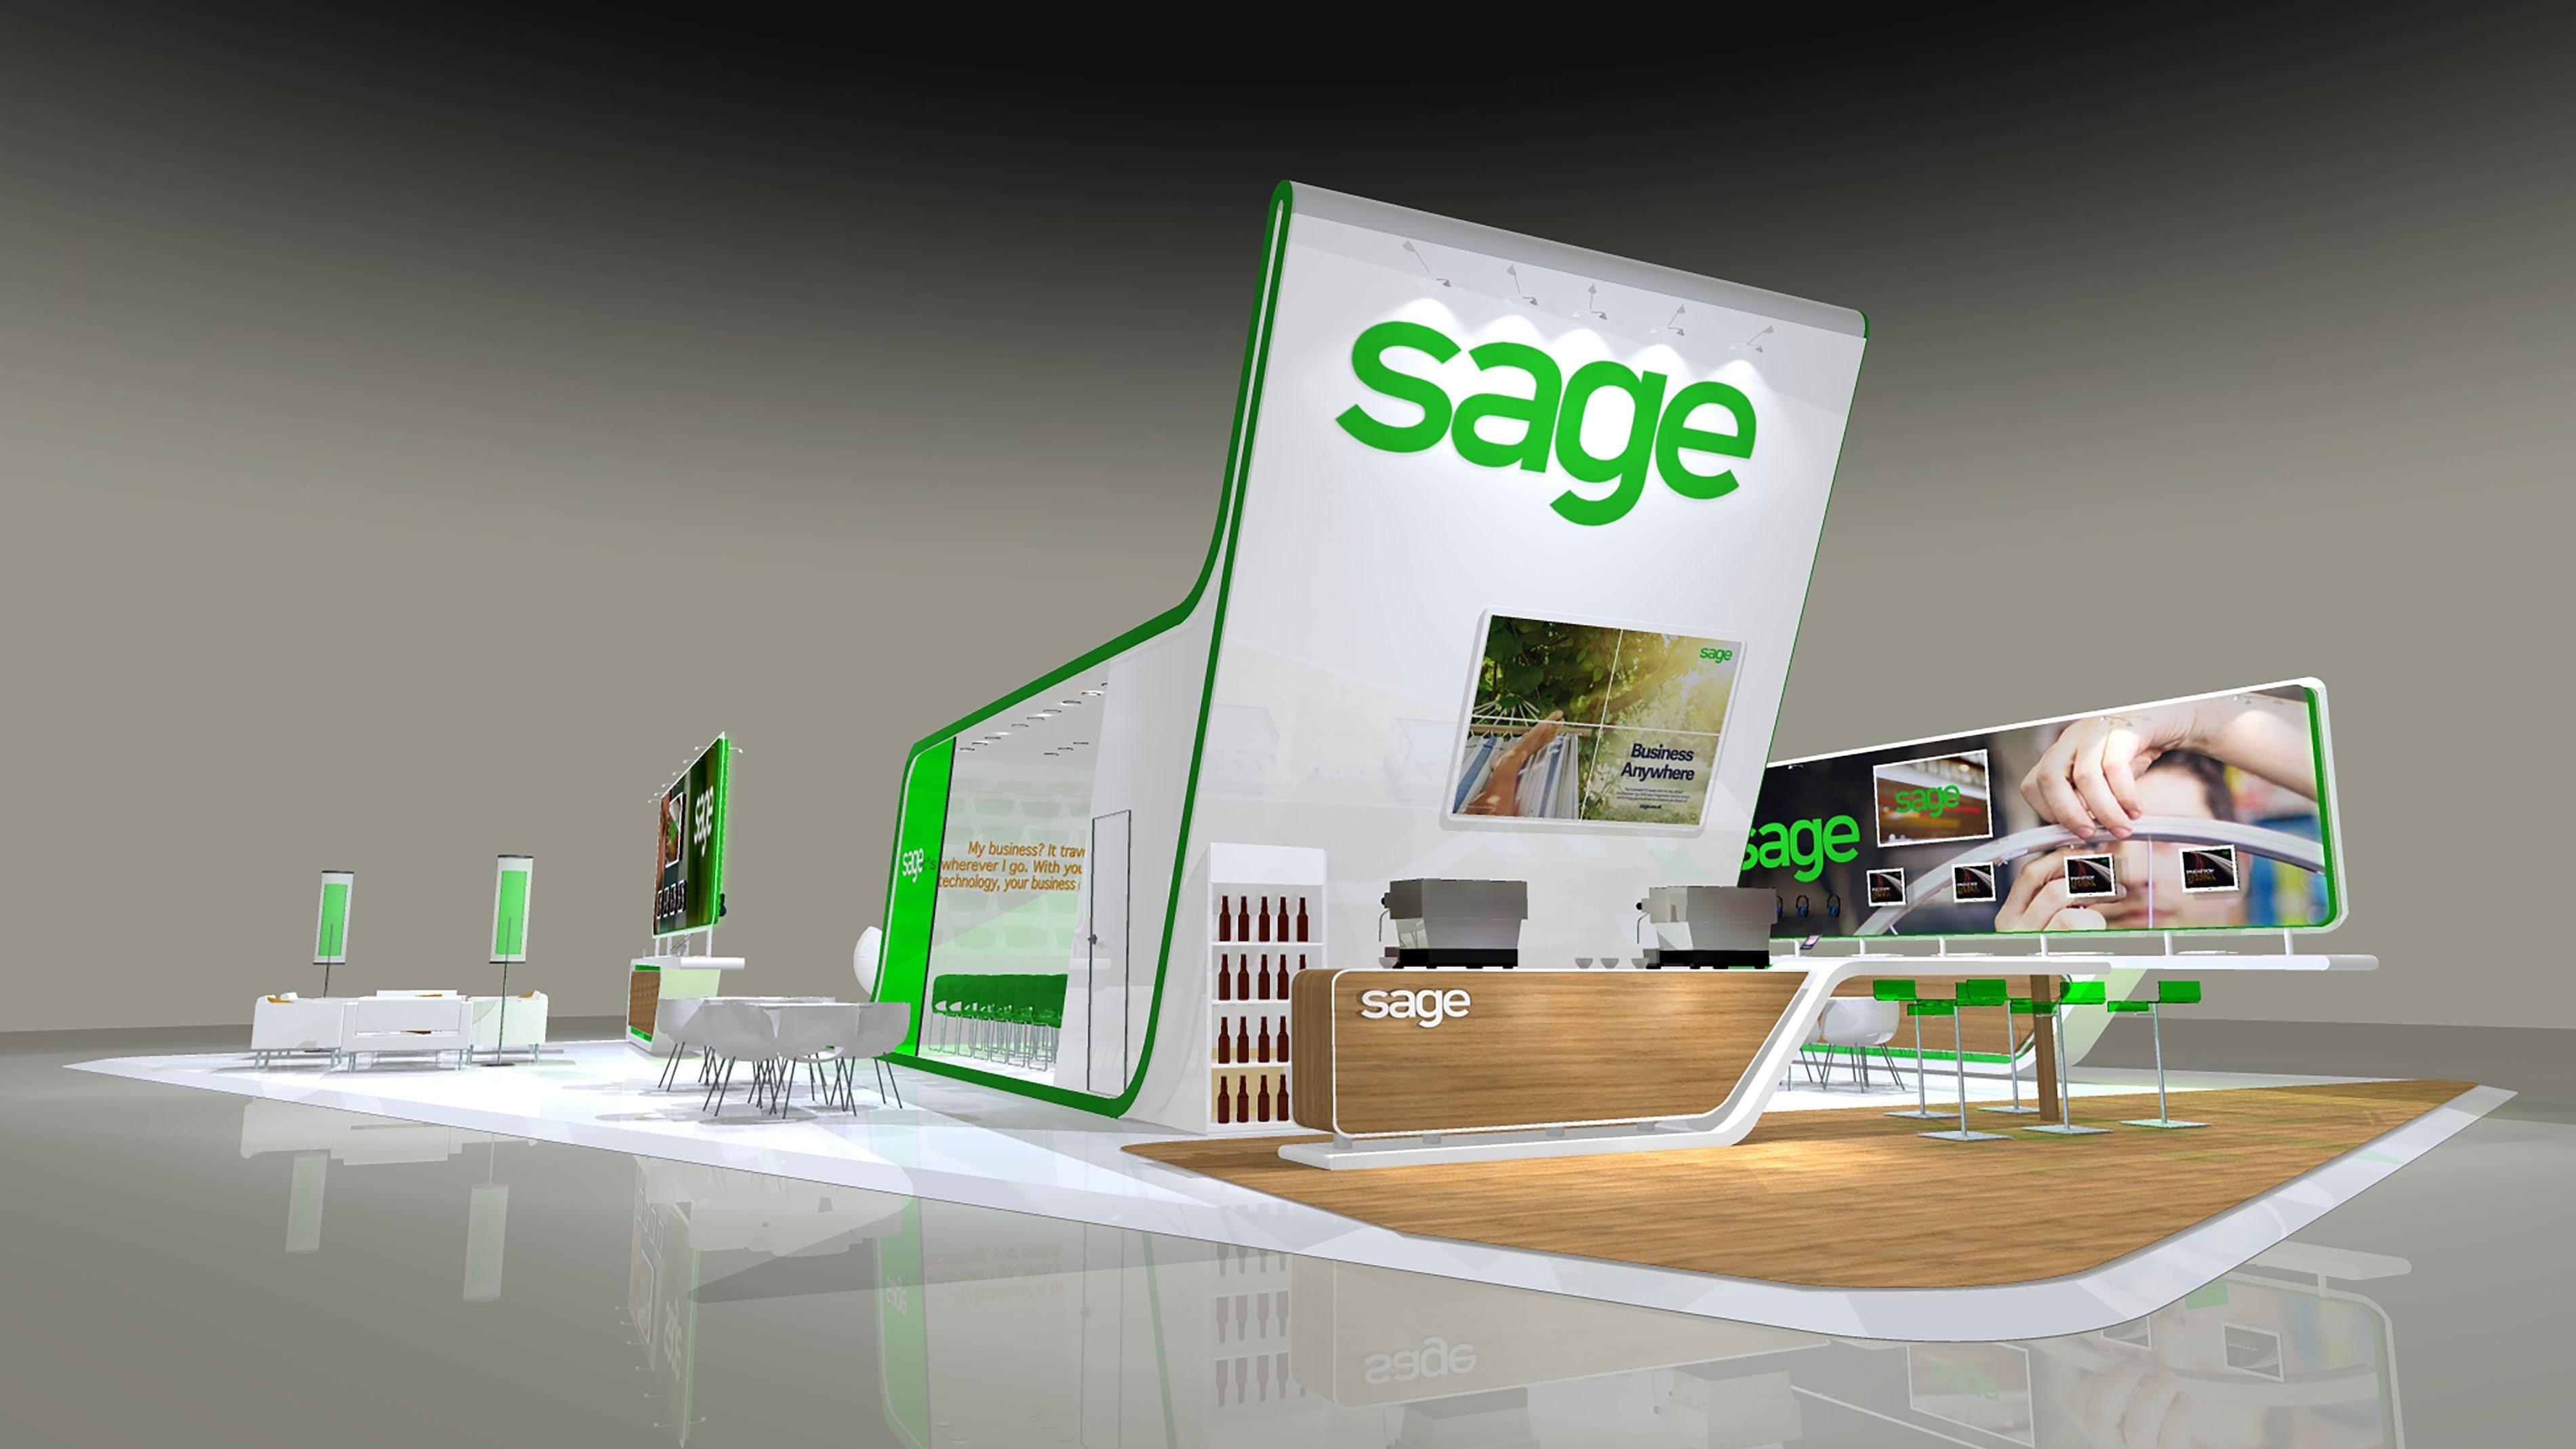 Exhibition Booth Design Uk : Parker design consultants creative agency london